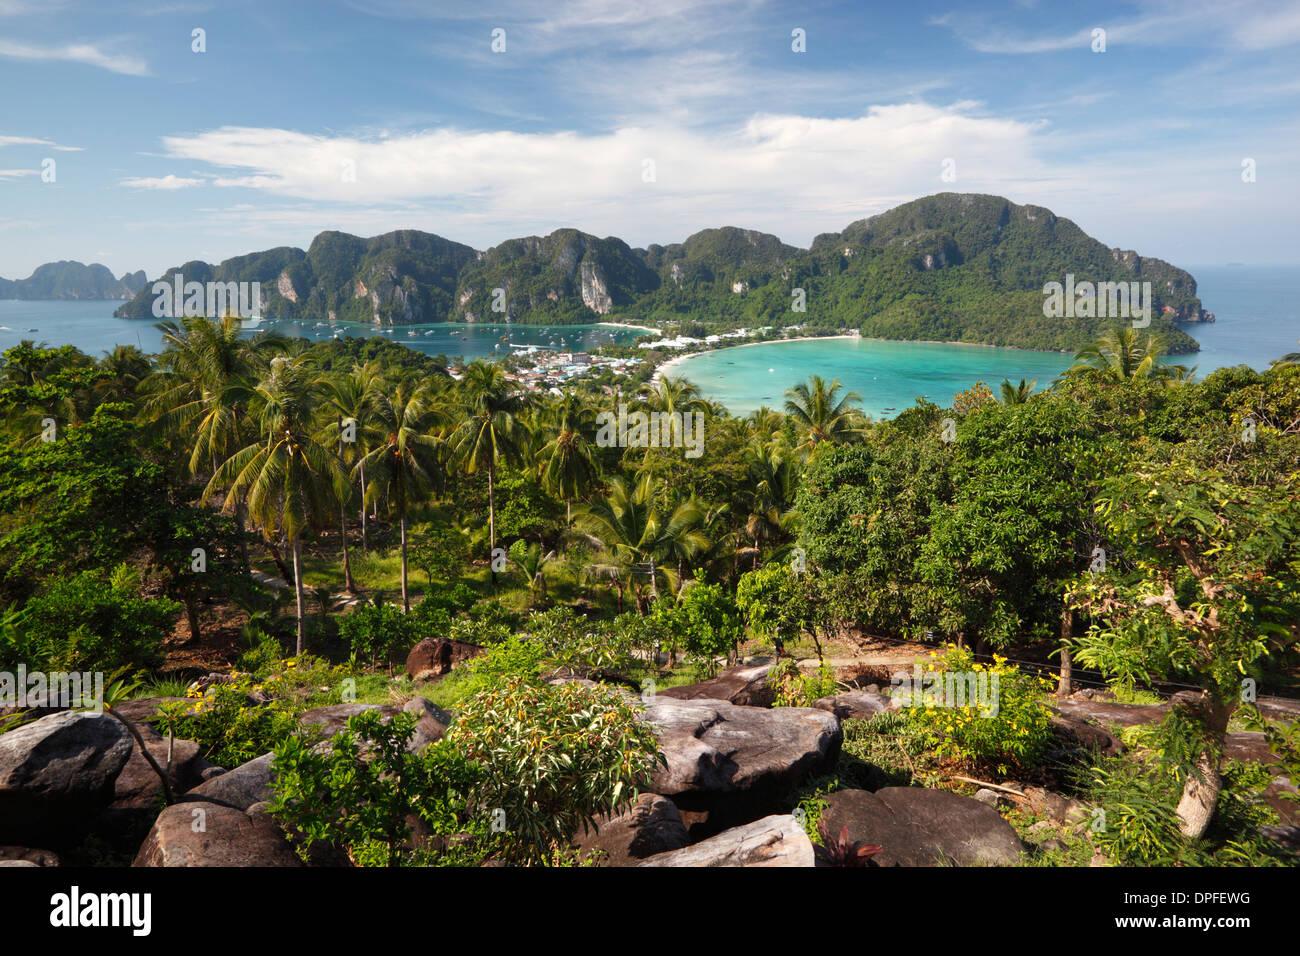 Ao Ton Sai and Ao Dalam bays from viewpoint, Koh Phi Phi, Krabi Province, Thailand, Southeast Asia, Asia - Stock Image